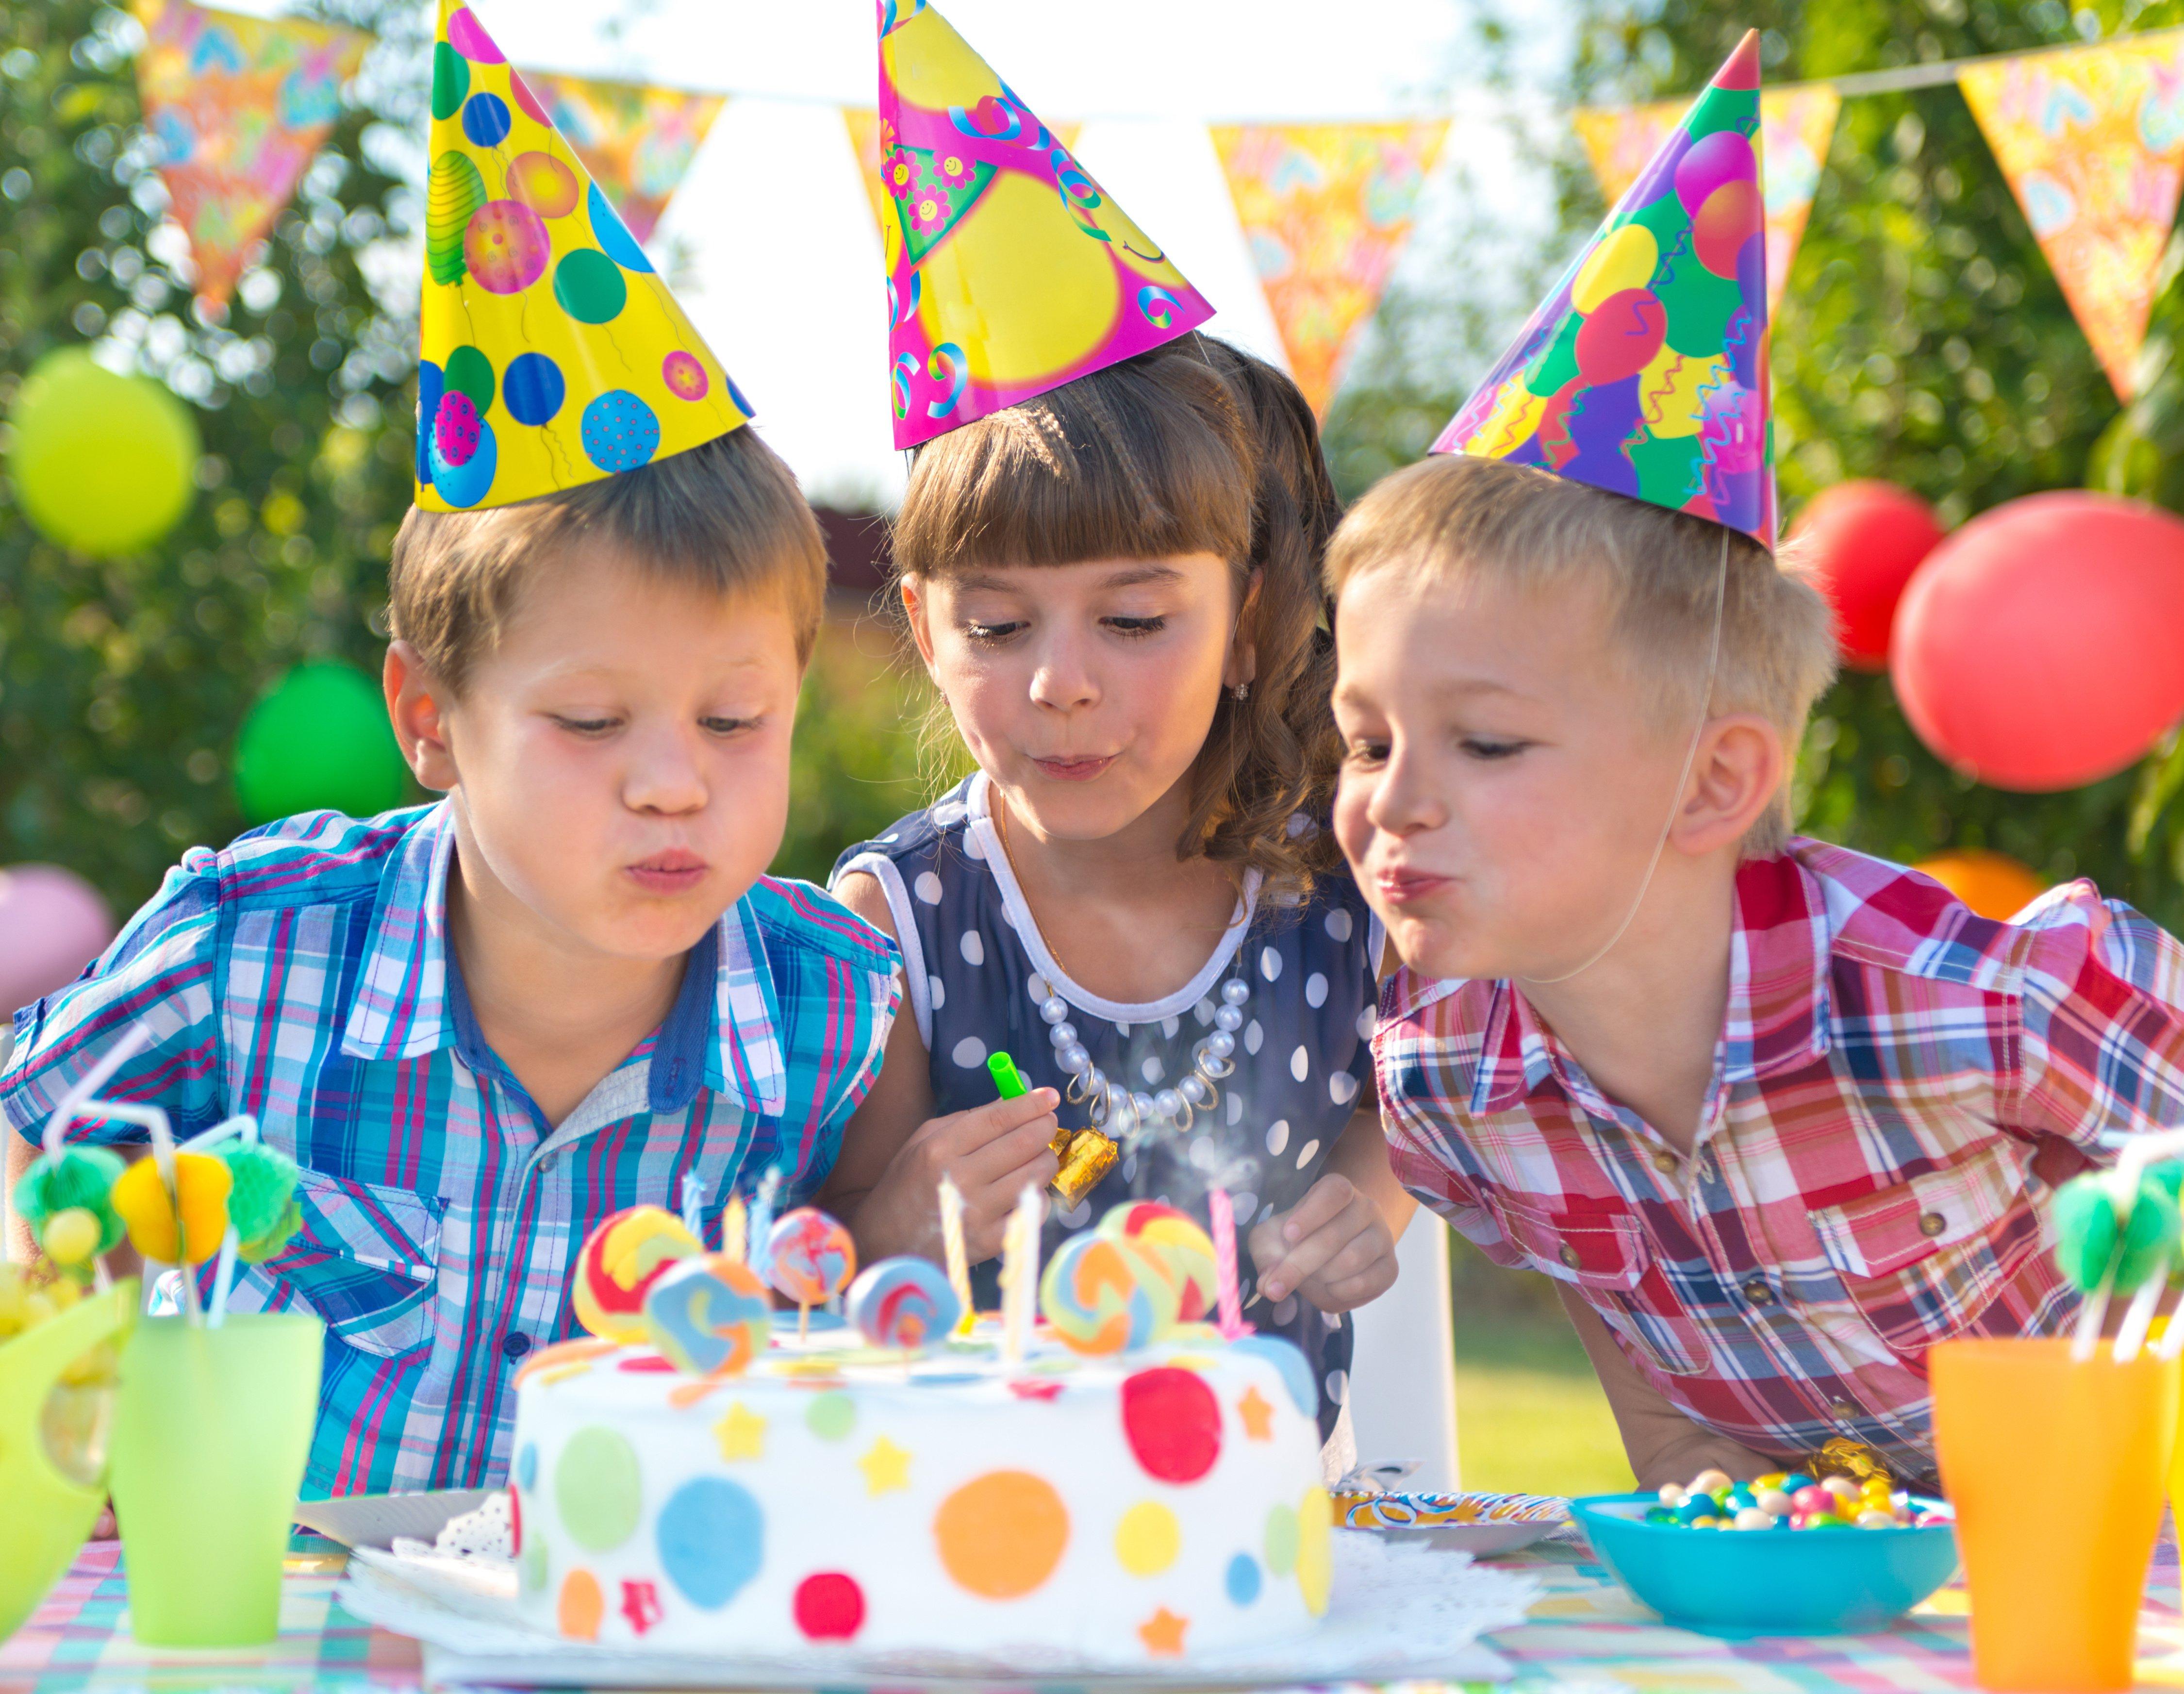 How to De-stress Birthday Parties